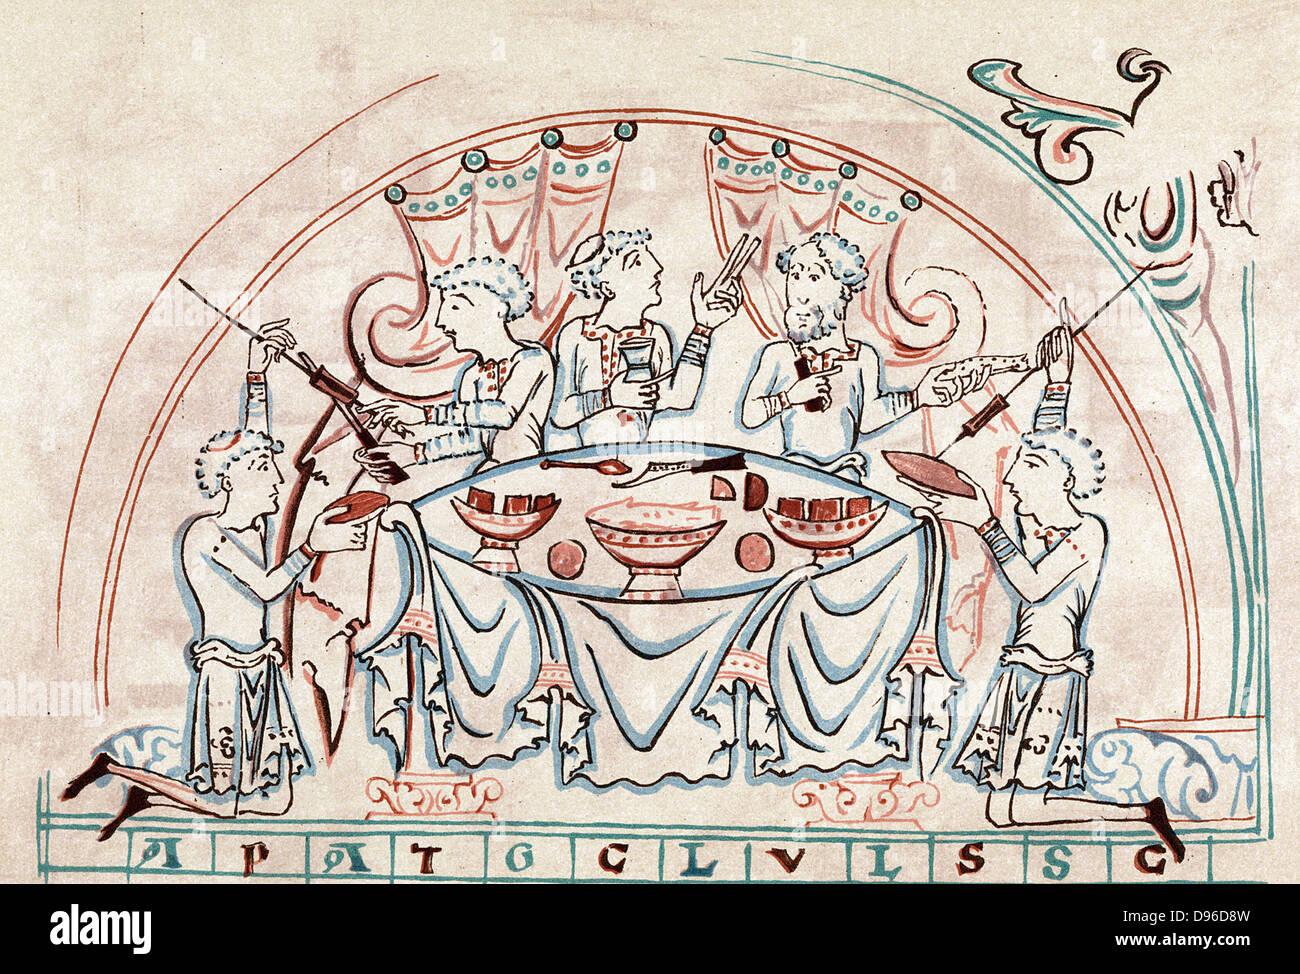 Bankett. Farblitho nach englischen Psalter 11. Jahrhundert Stockbild